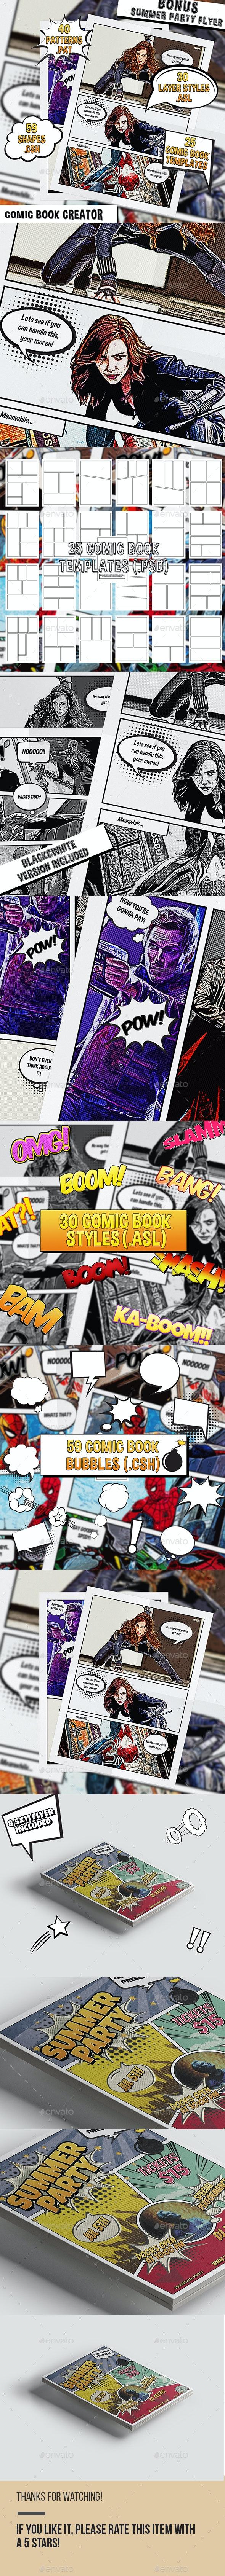 Comic Book Creator - Artistic Photo Templates